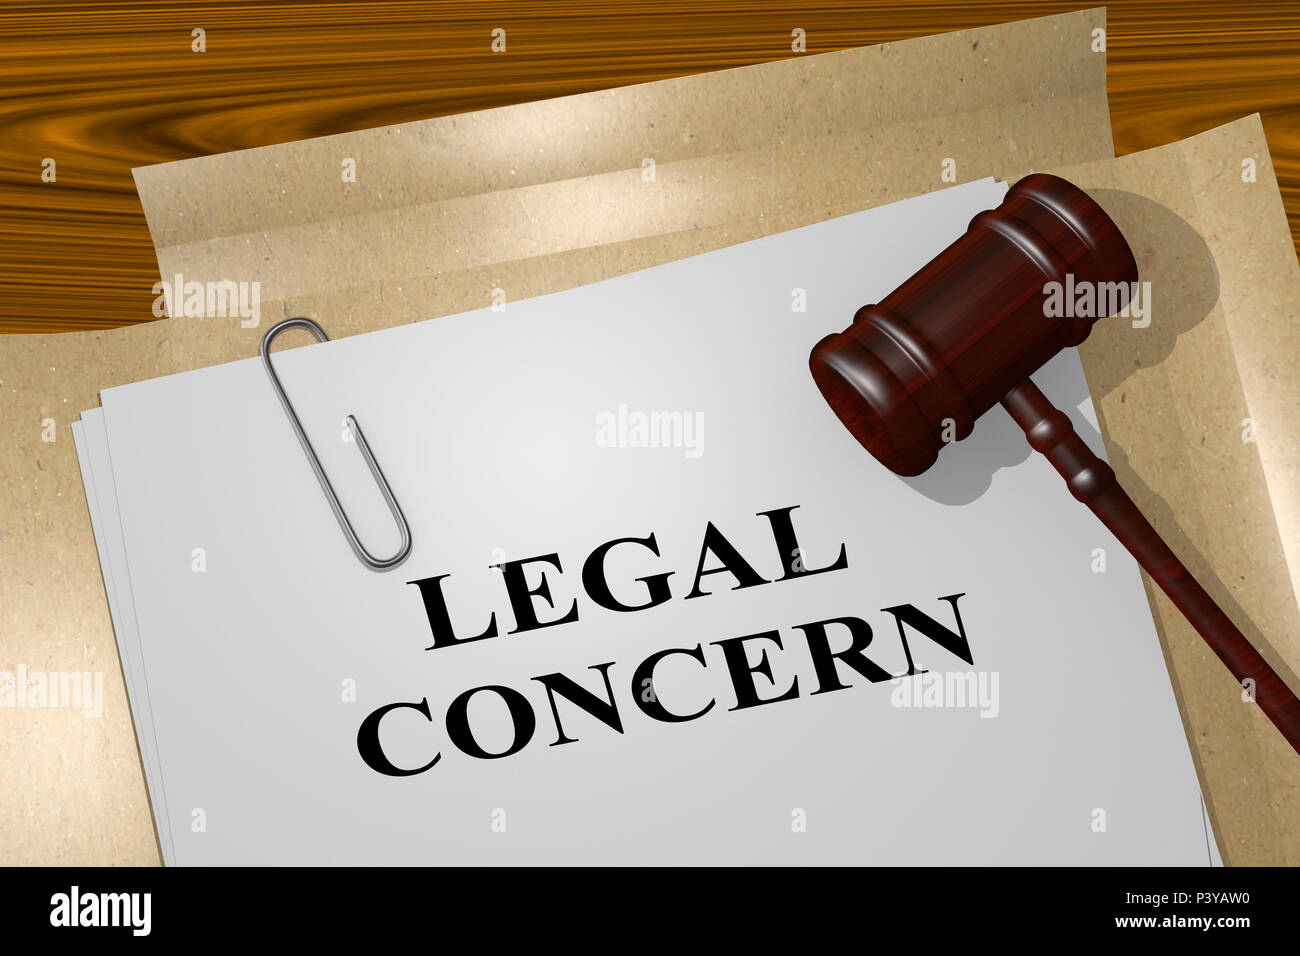 3D illustration of LEGAL CONCERN title on legal document - Stock Image